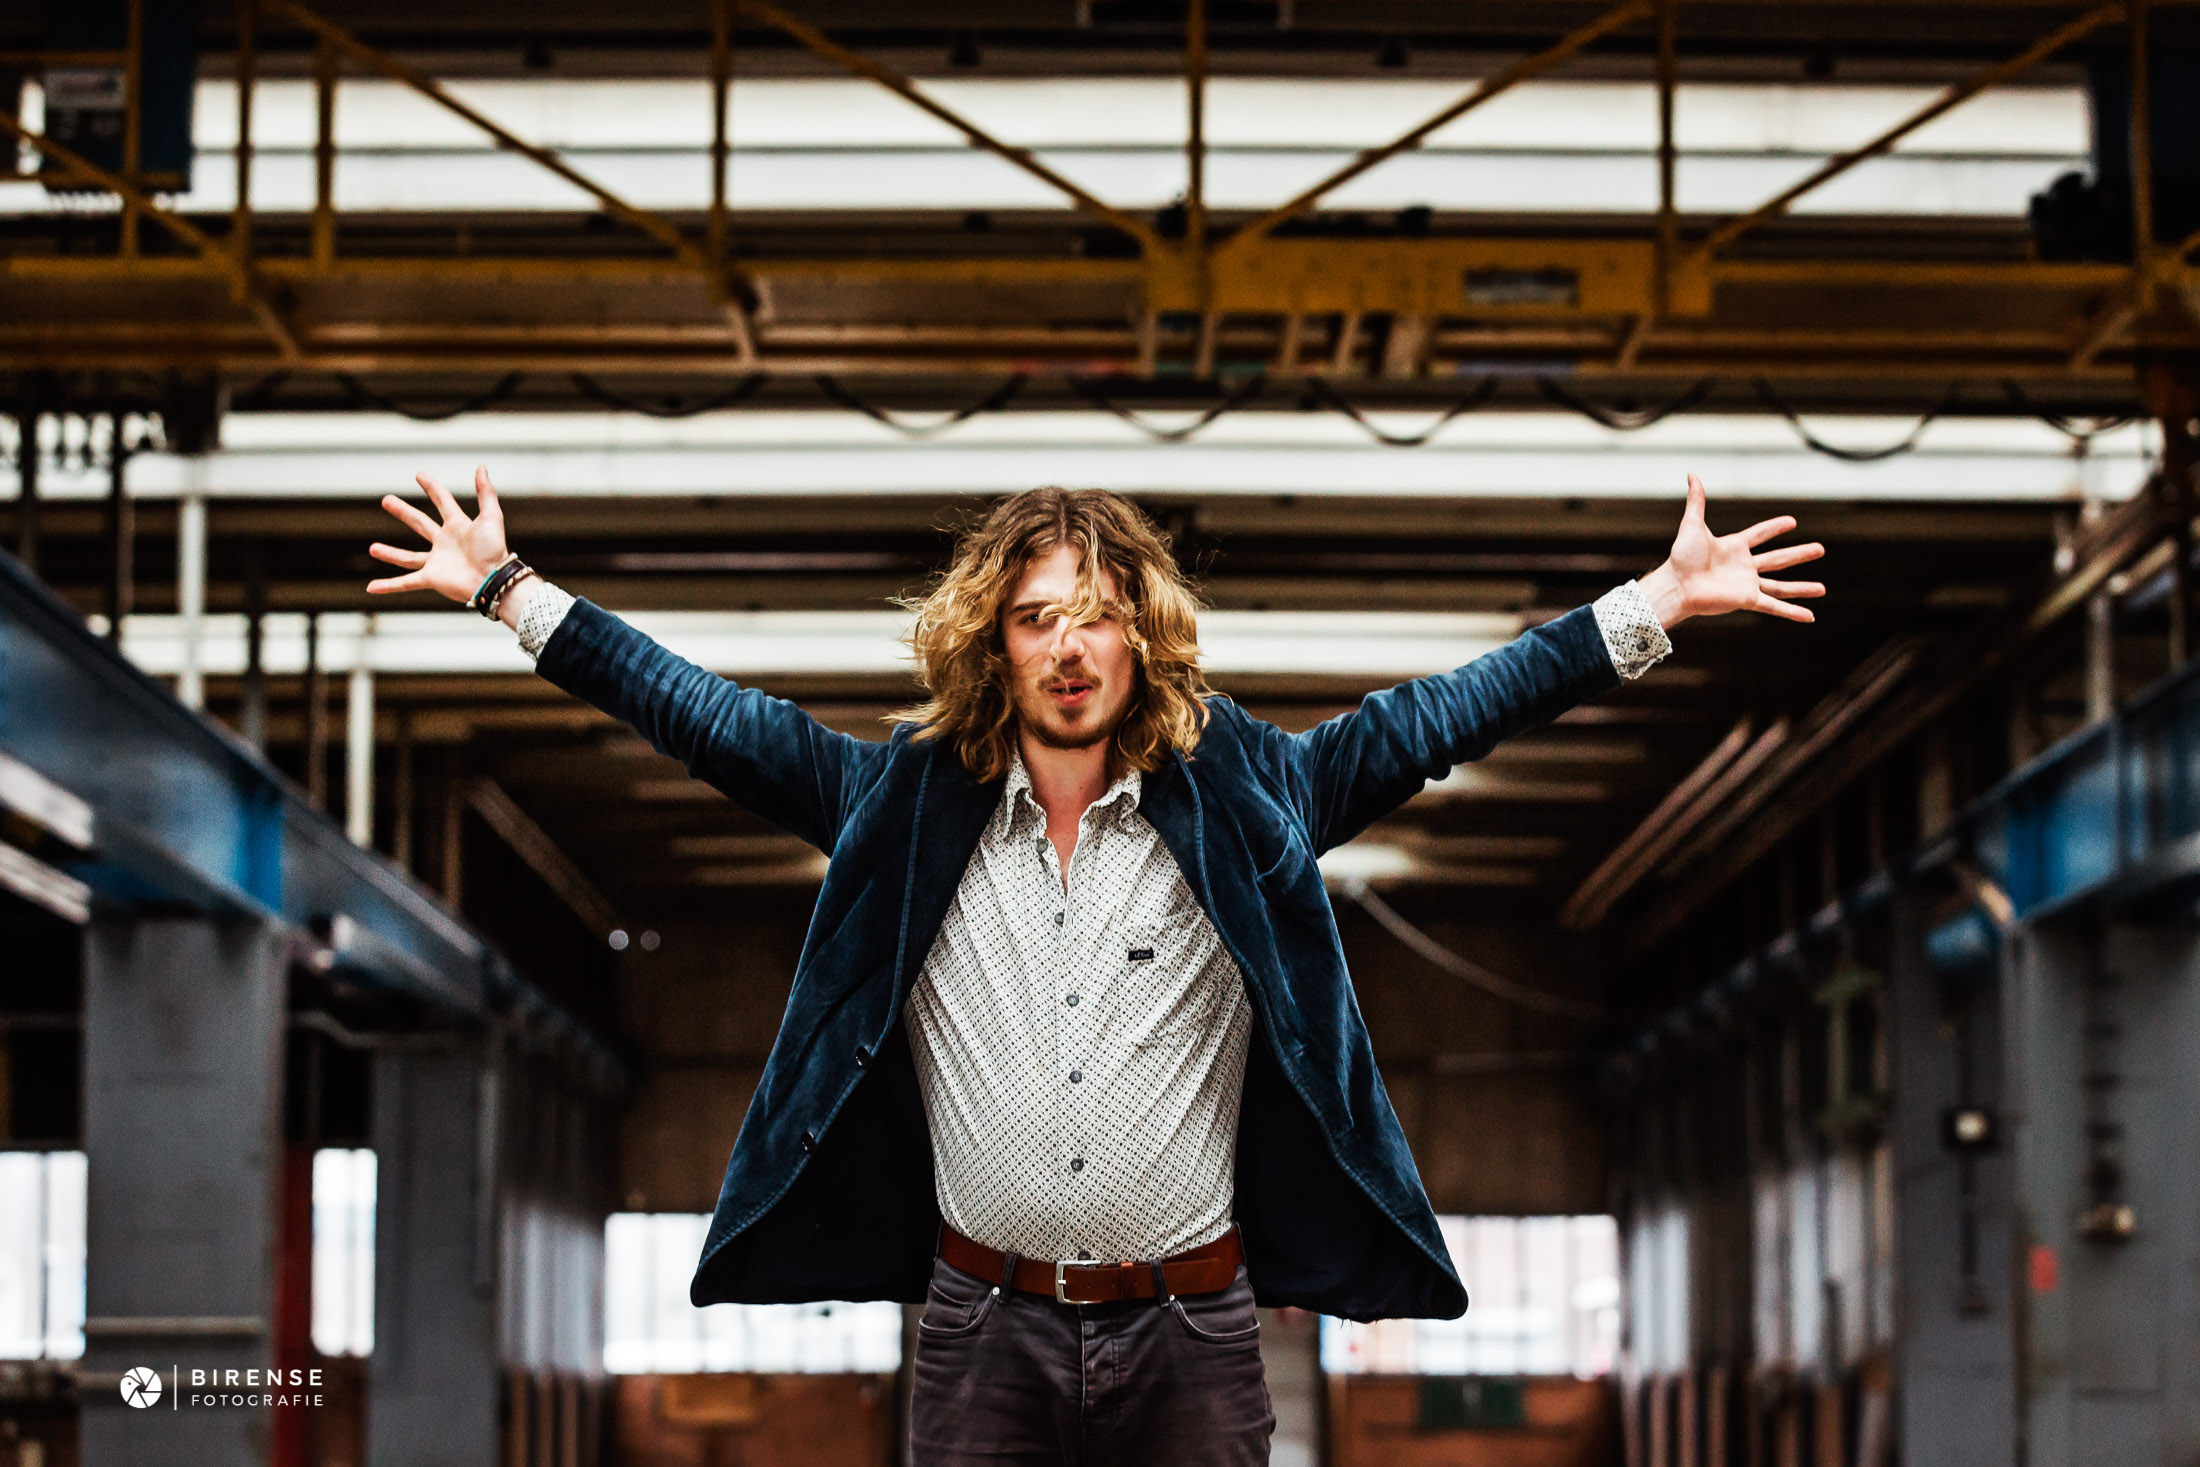 Between The Jars rock band The Netherlands - key Jesper portrait 2018 by Birense Fotografie (1 van 1).jpg